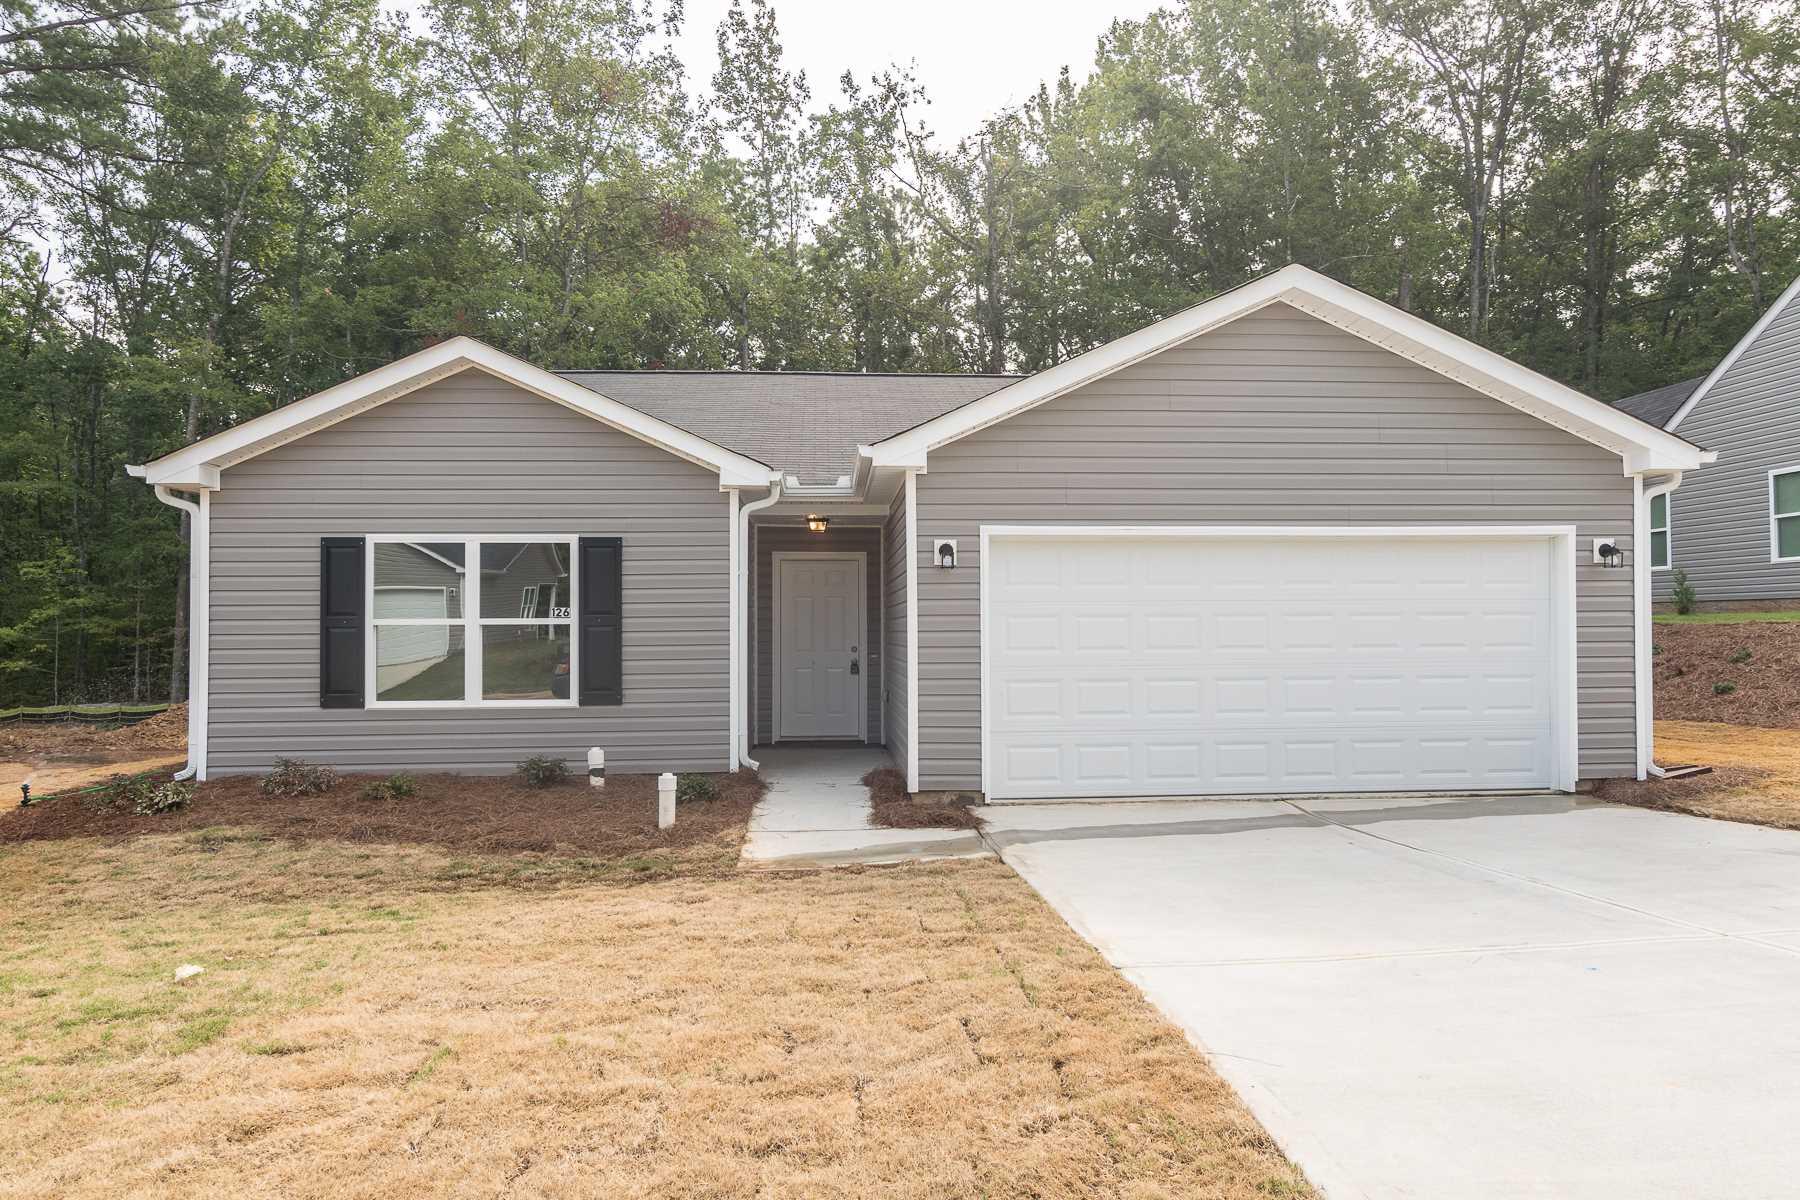 138 (LOT 130) MISTY GROVE LANE, Lake Oconee in Putnam County, GA 31024 Home for Sale